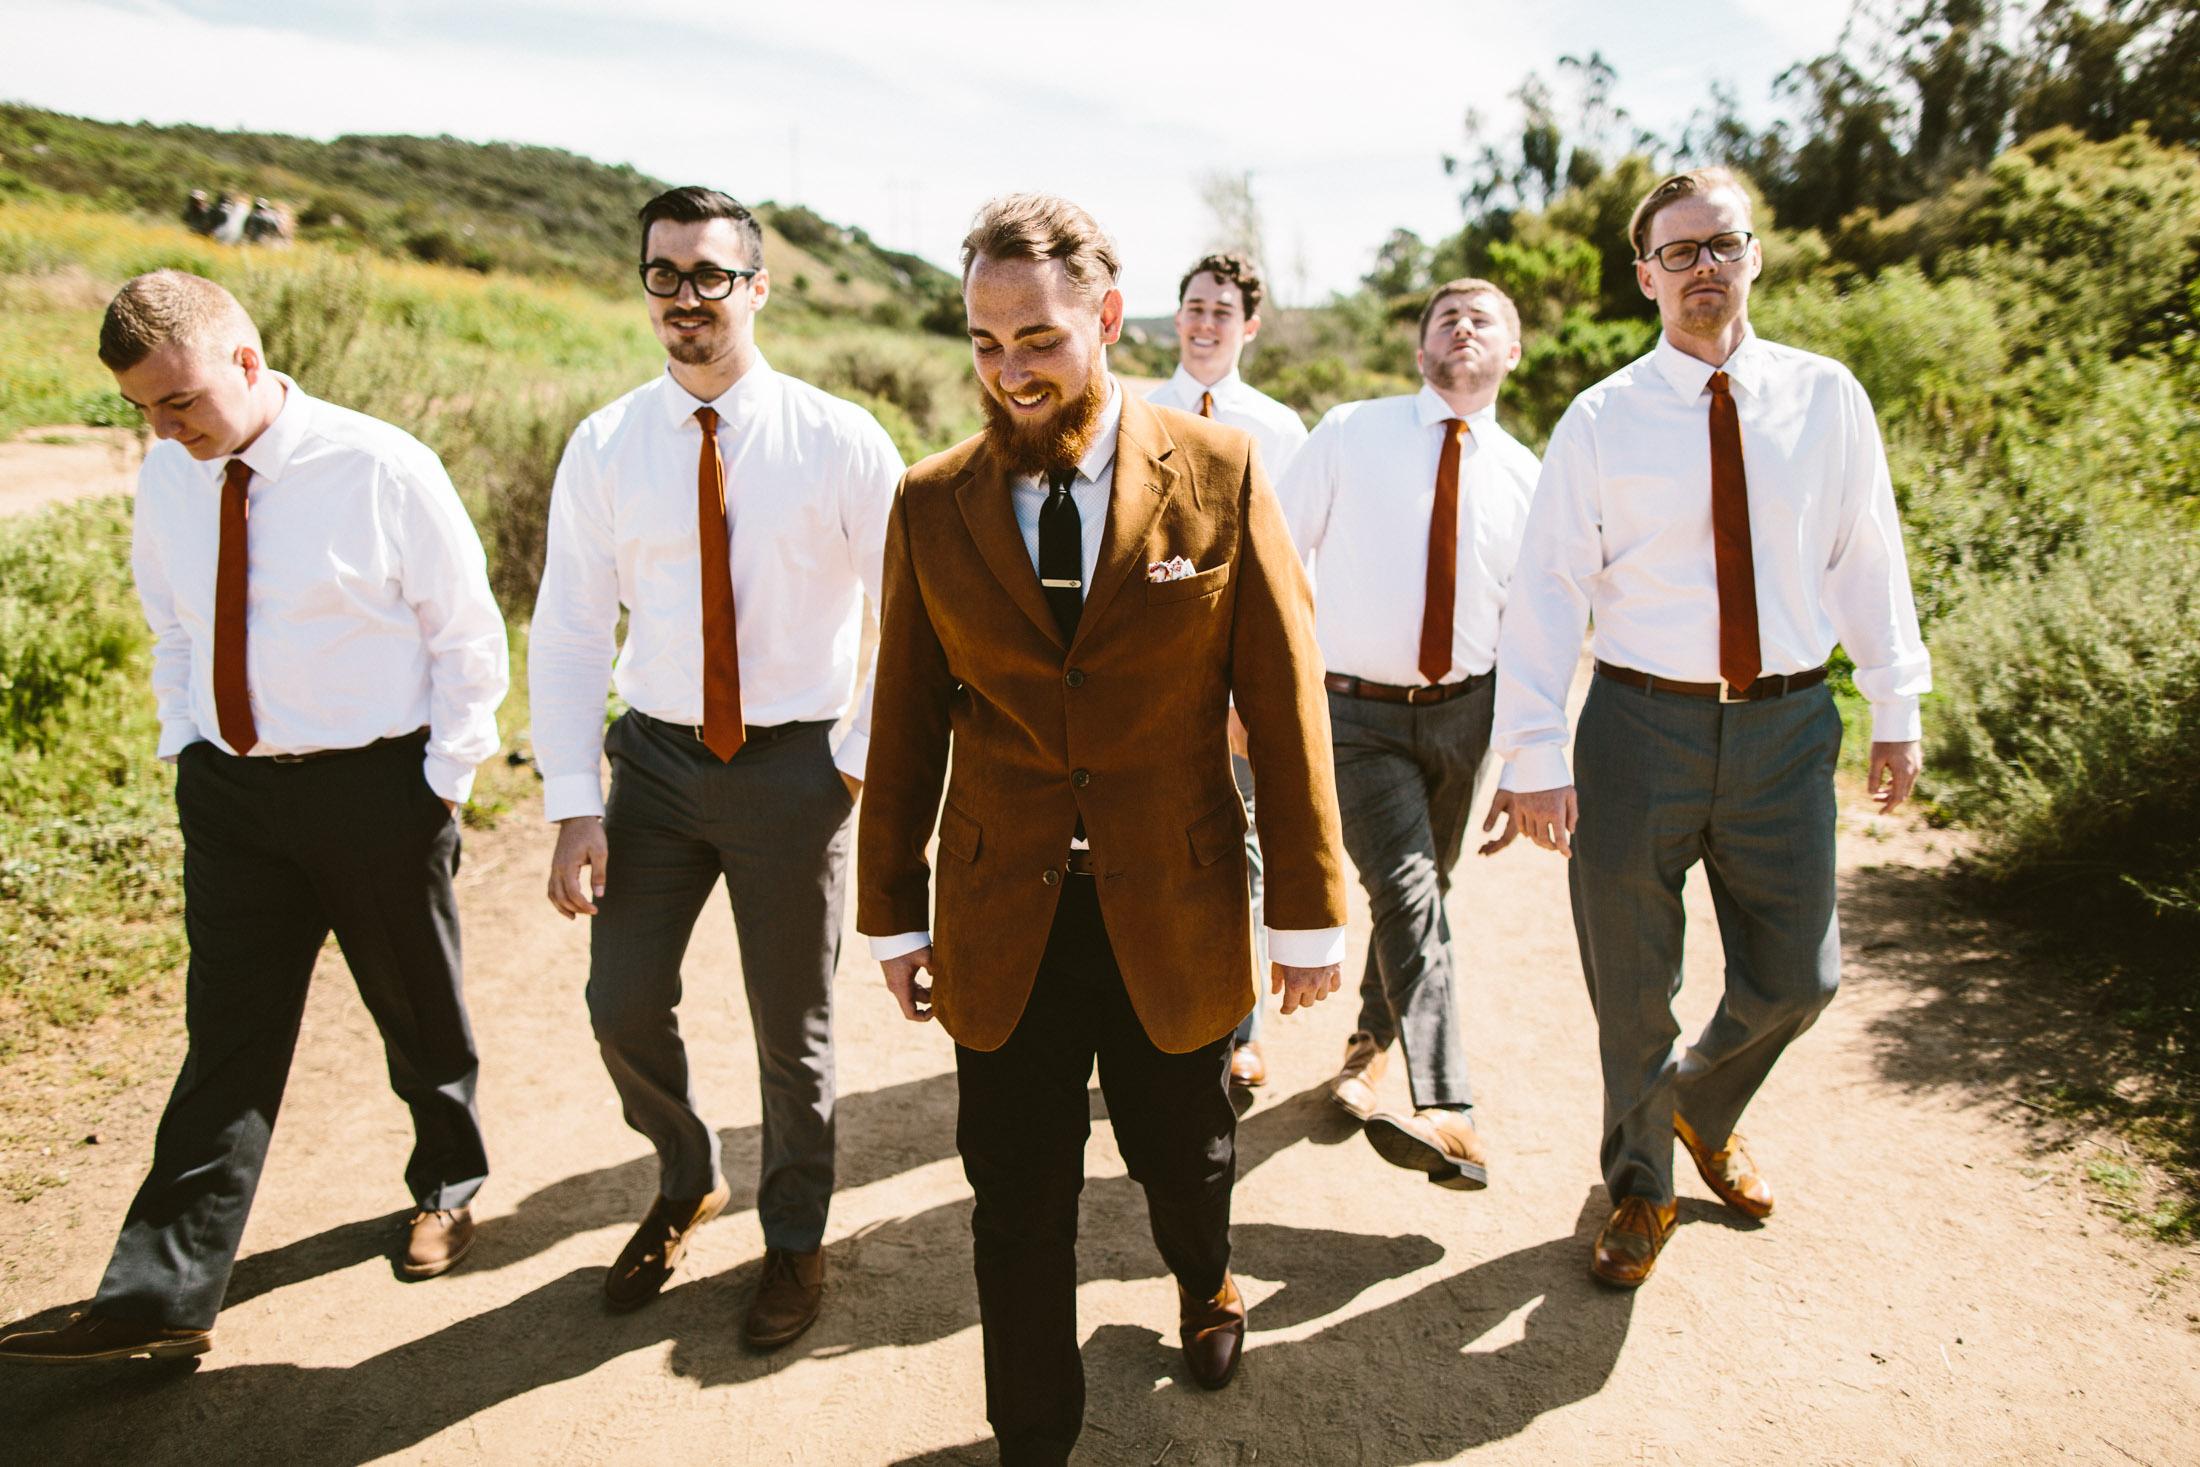 The-woodshed-booze-brothers-venue-wedding-22.jpg